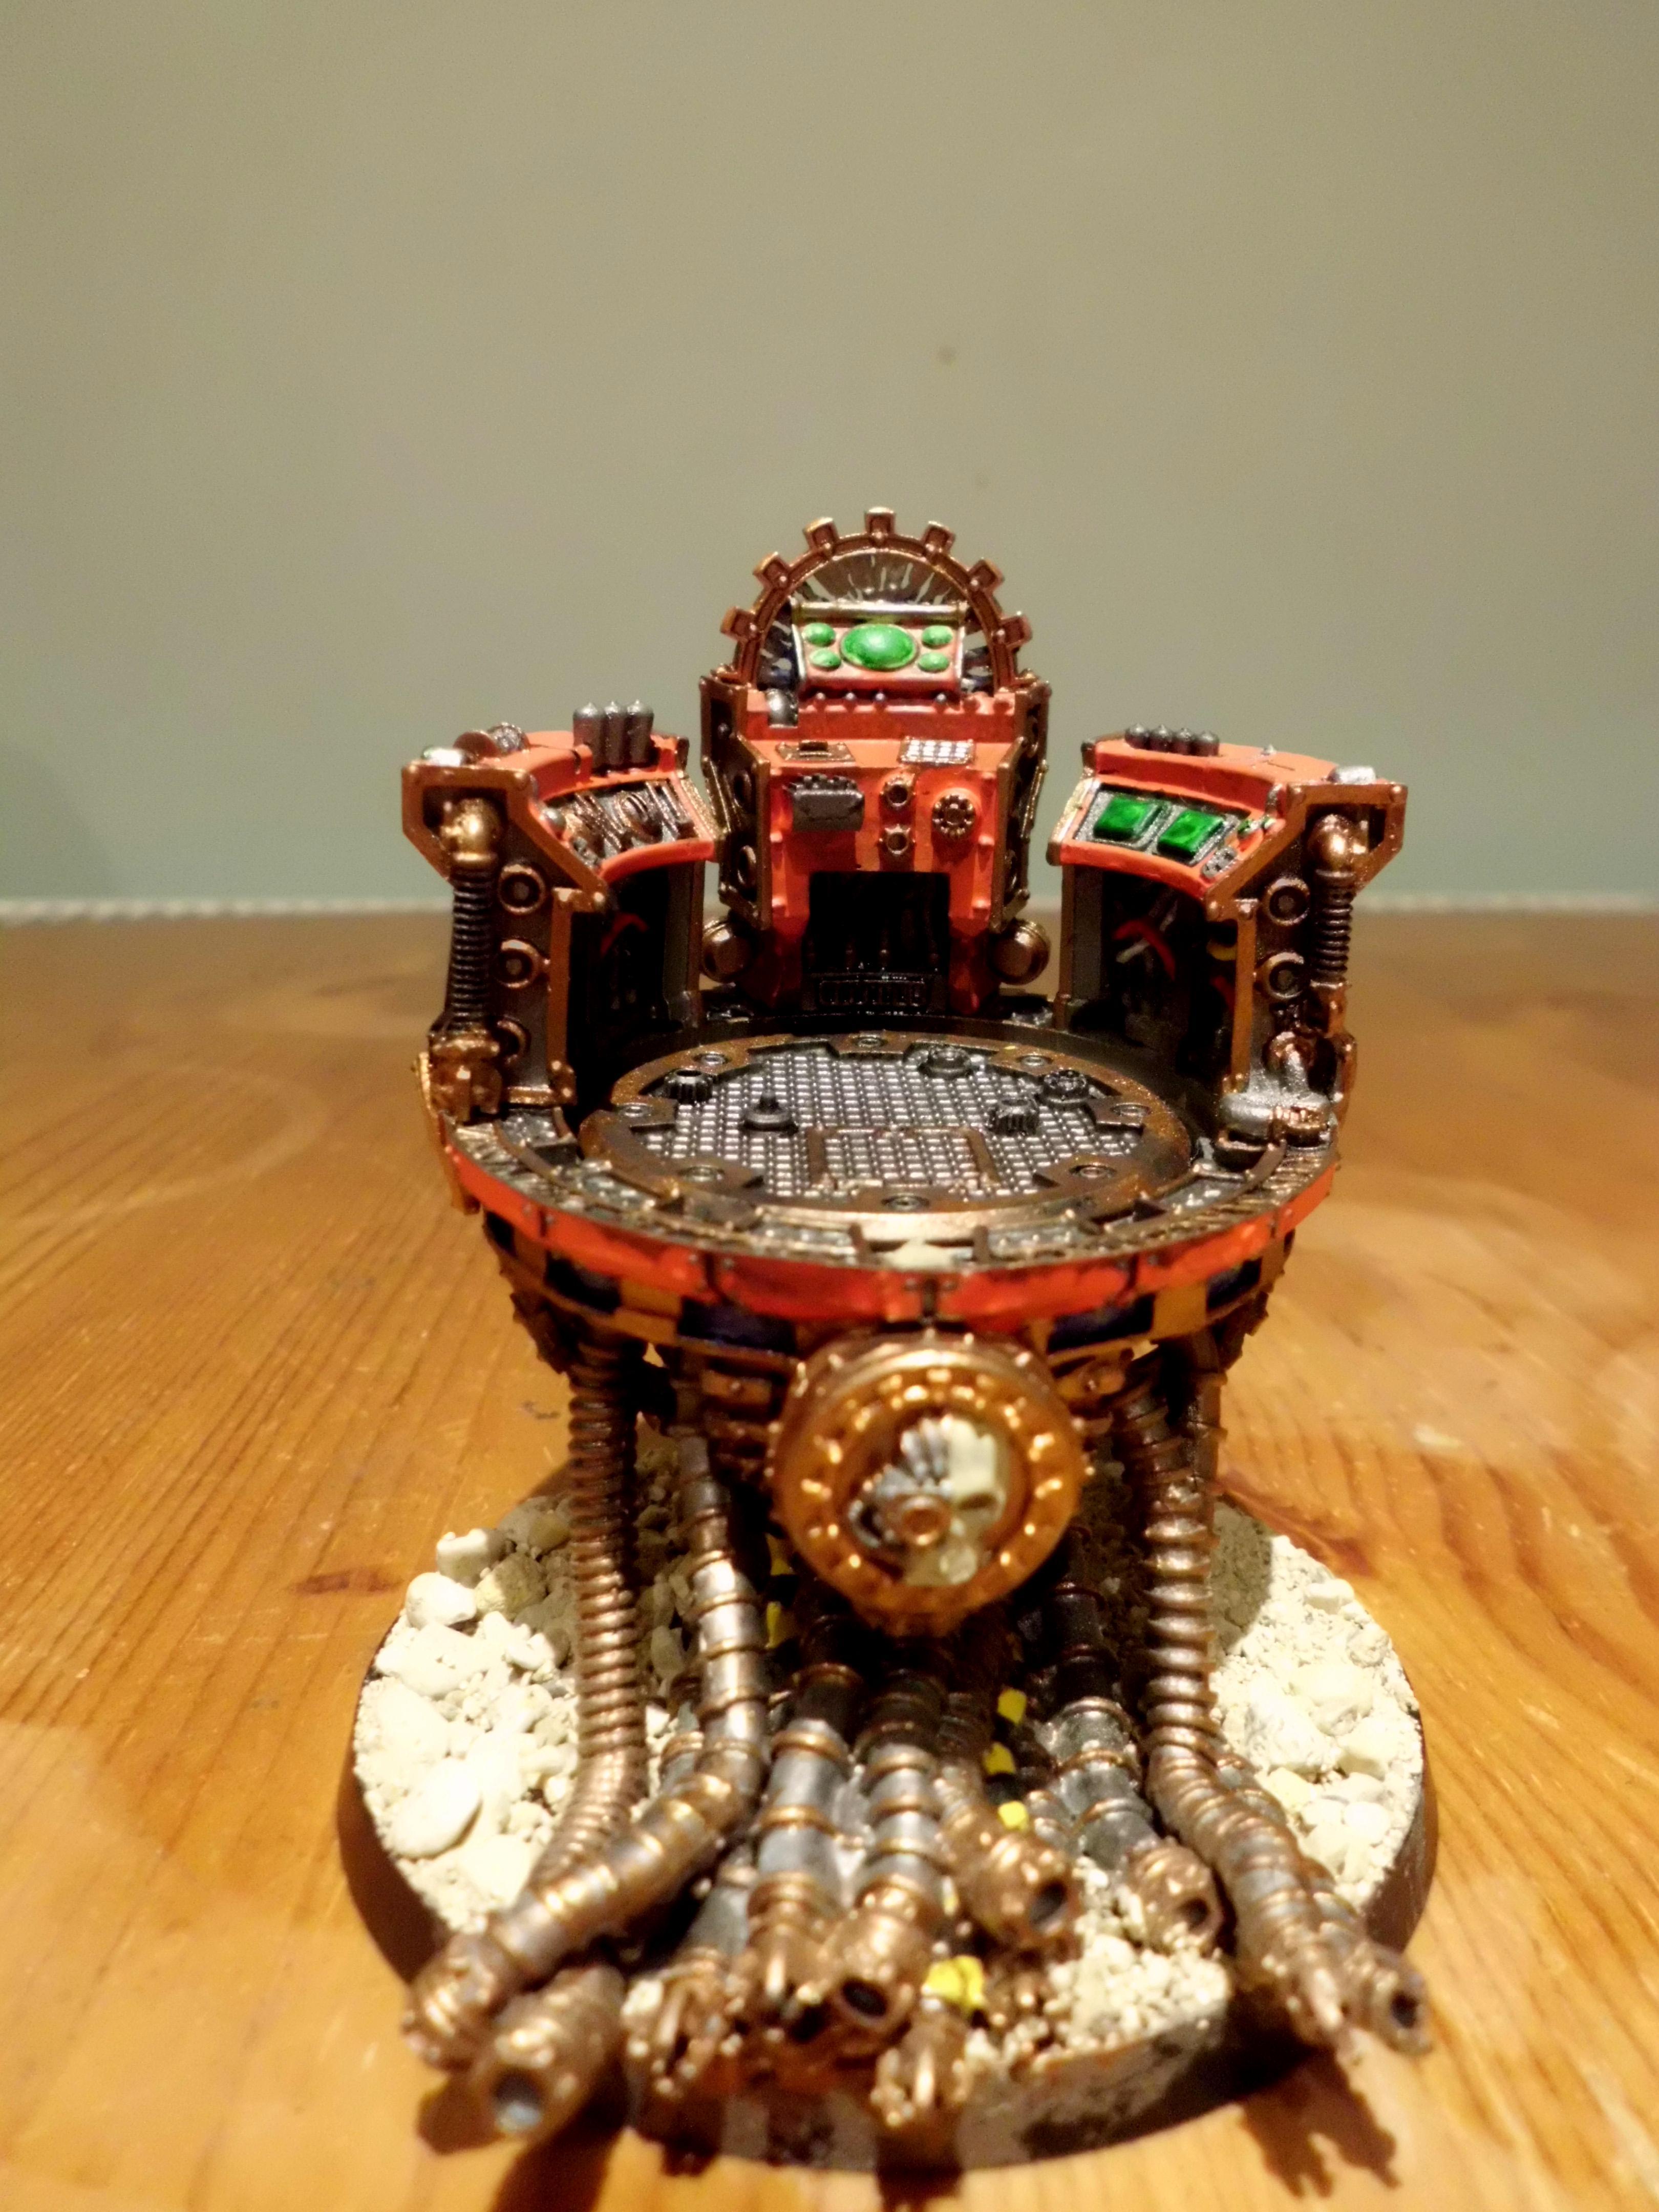 30k, Abeyant, Forgeworld Character Series, Mechanicum, Ordo Reductor, Taghmata, The Horus Heresy